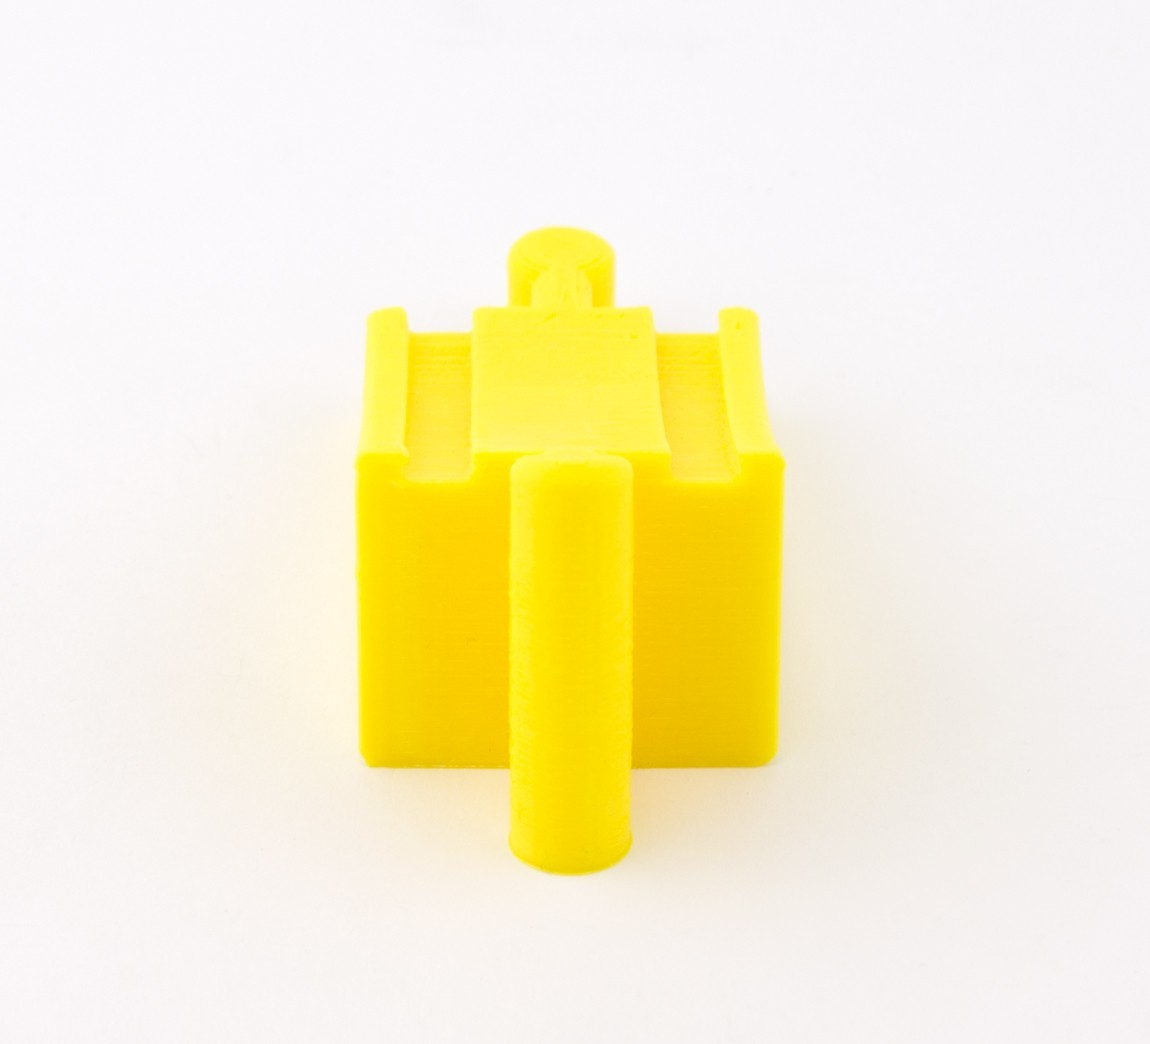 91cb4f62ceb4627f4039d91b0e40adb8_1449686645712_12.2.15-product-shoot-062.jpg Download free STL file Toy Train Tracks • 3D printer design, FerryTeacher